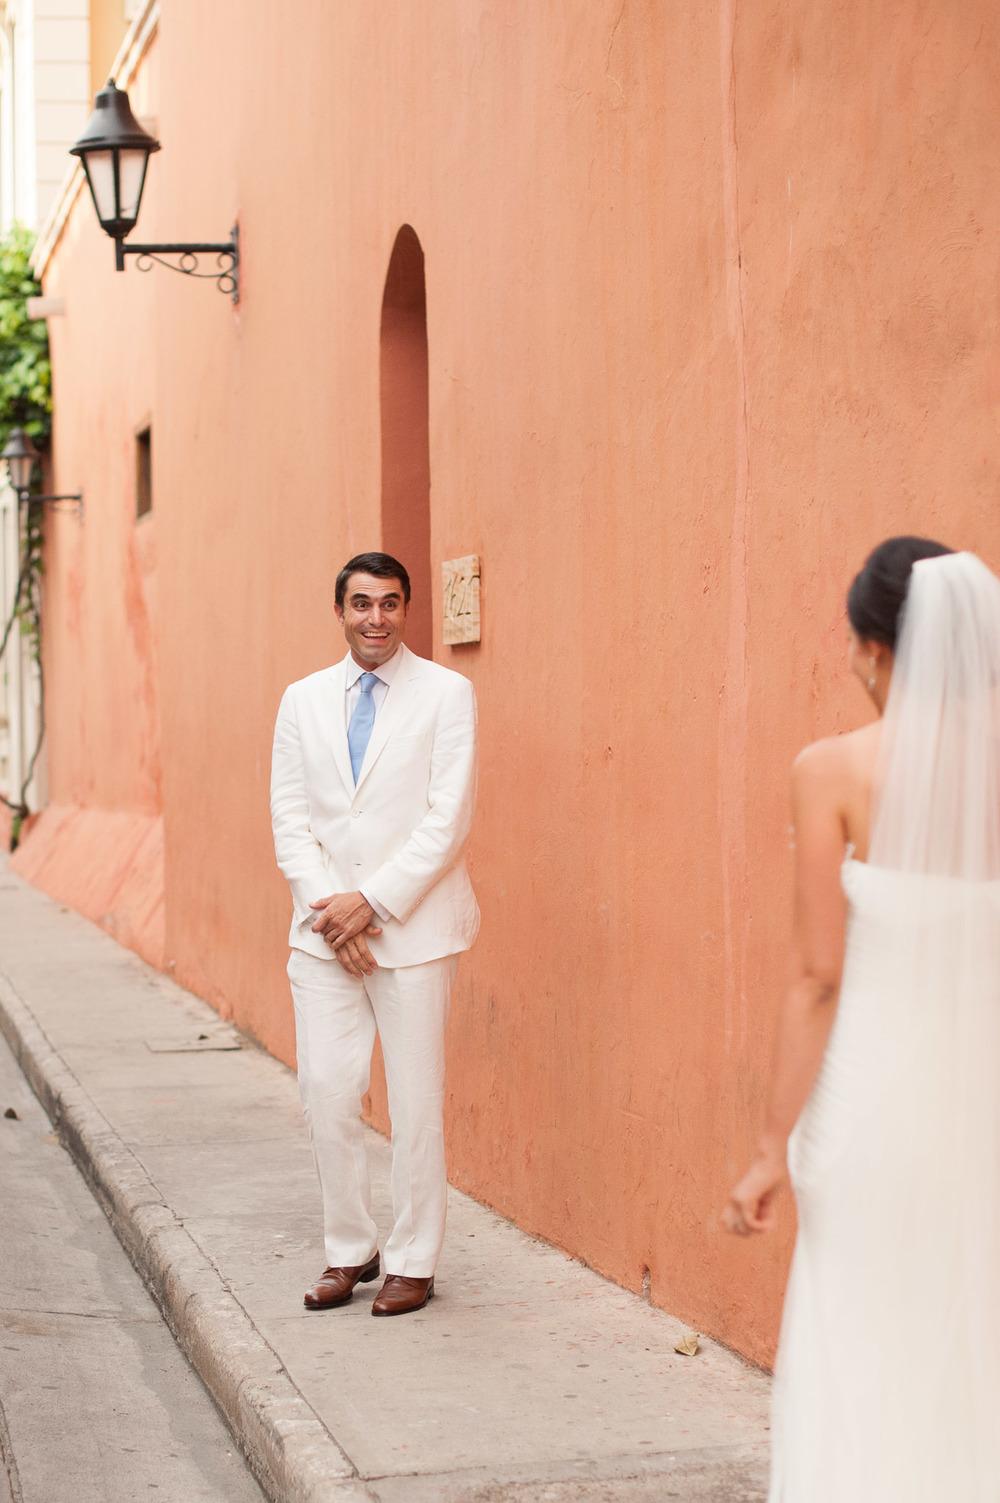 boda en cartagena_pablosalgado__PSB7272.jpg